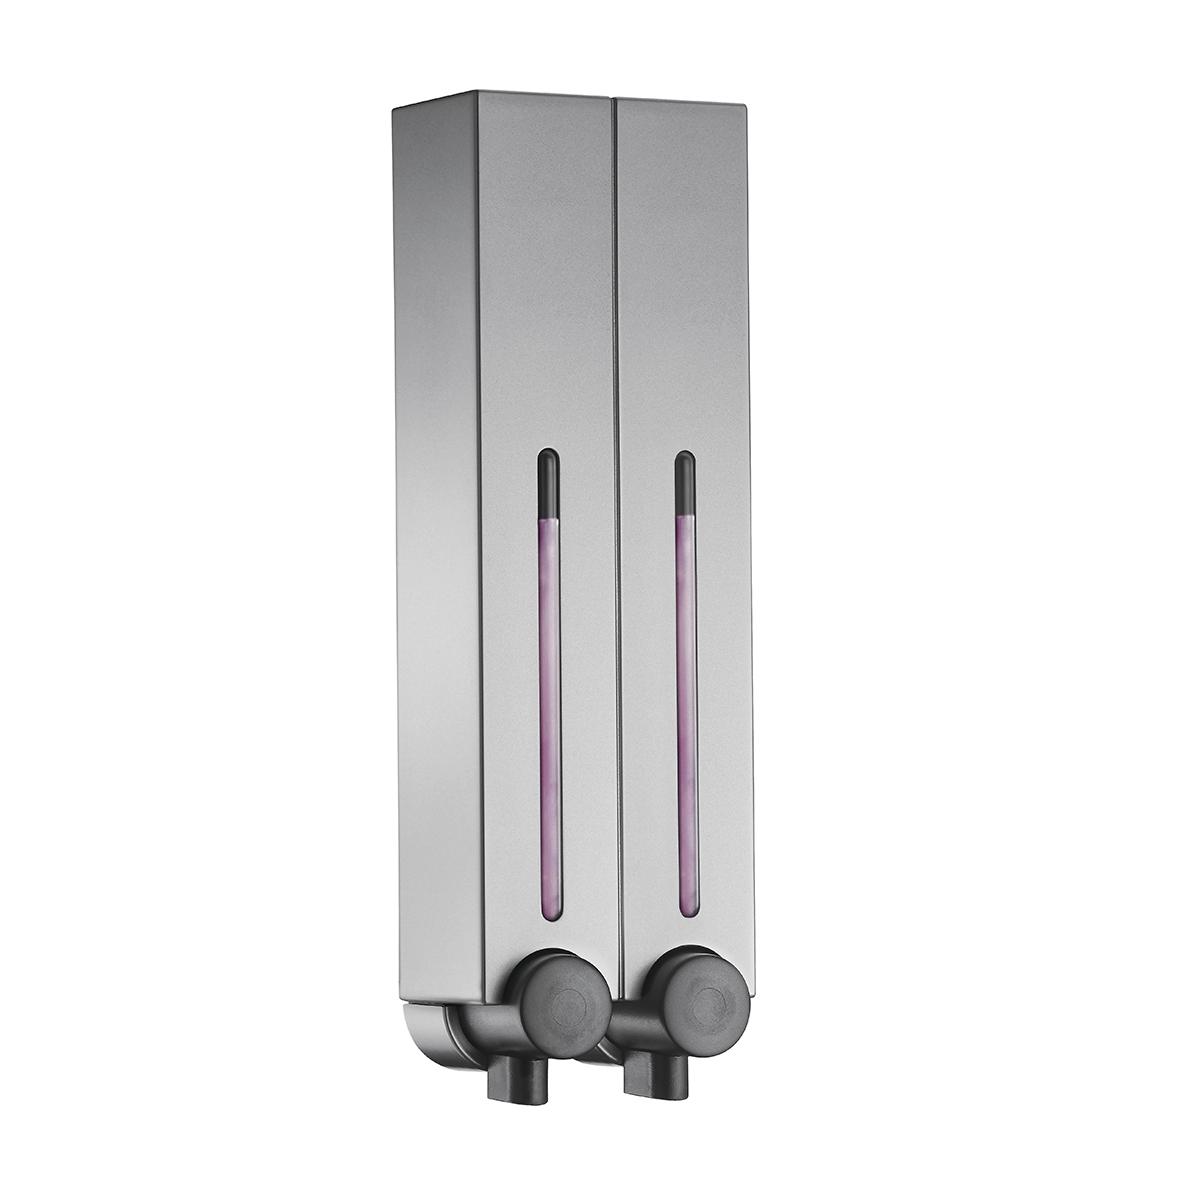 Shower Dispenser Declutter Your Space